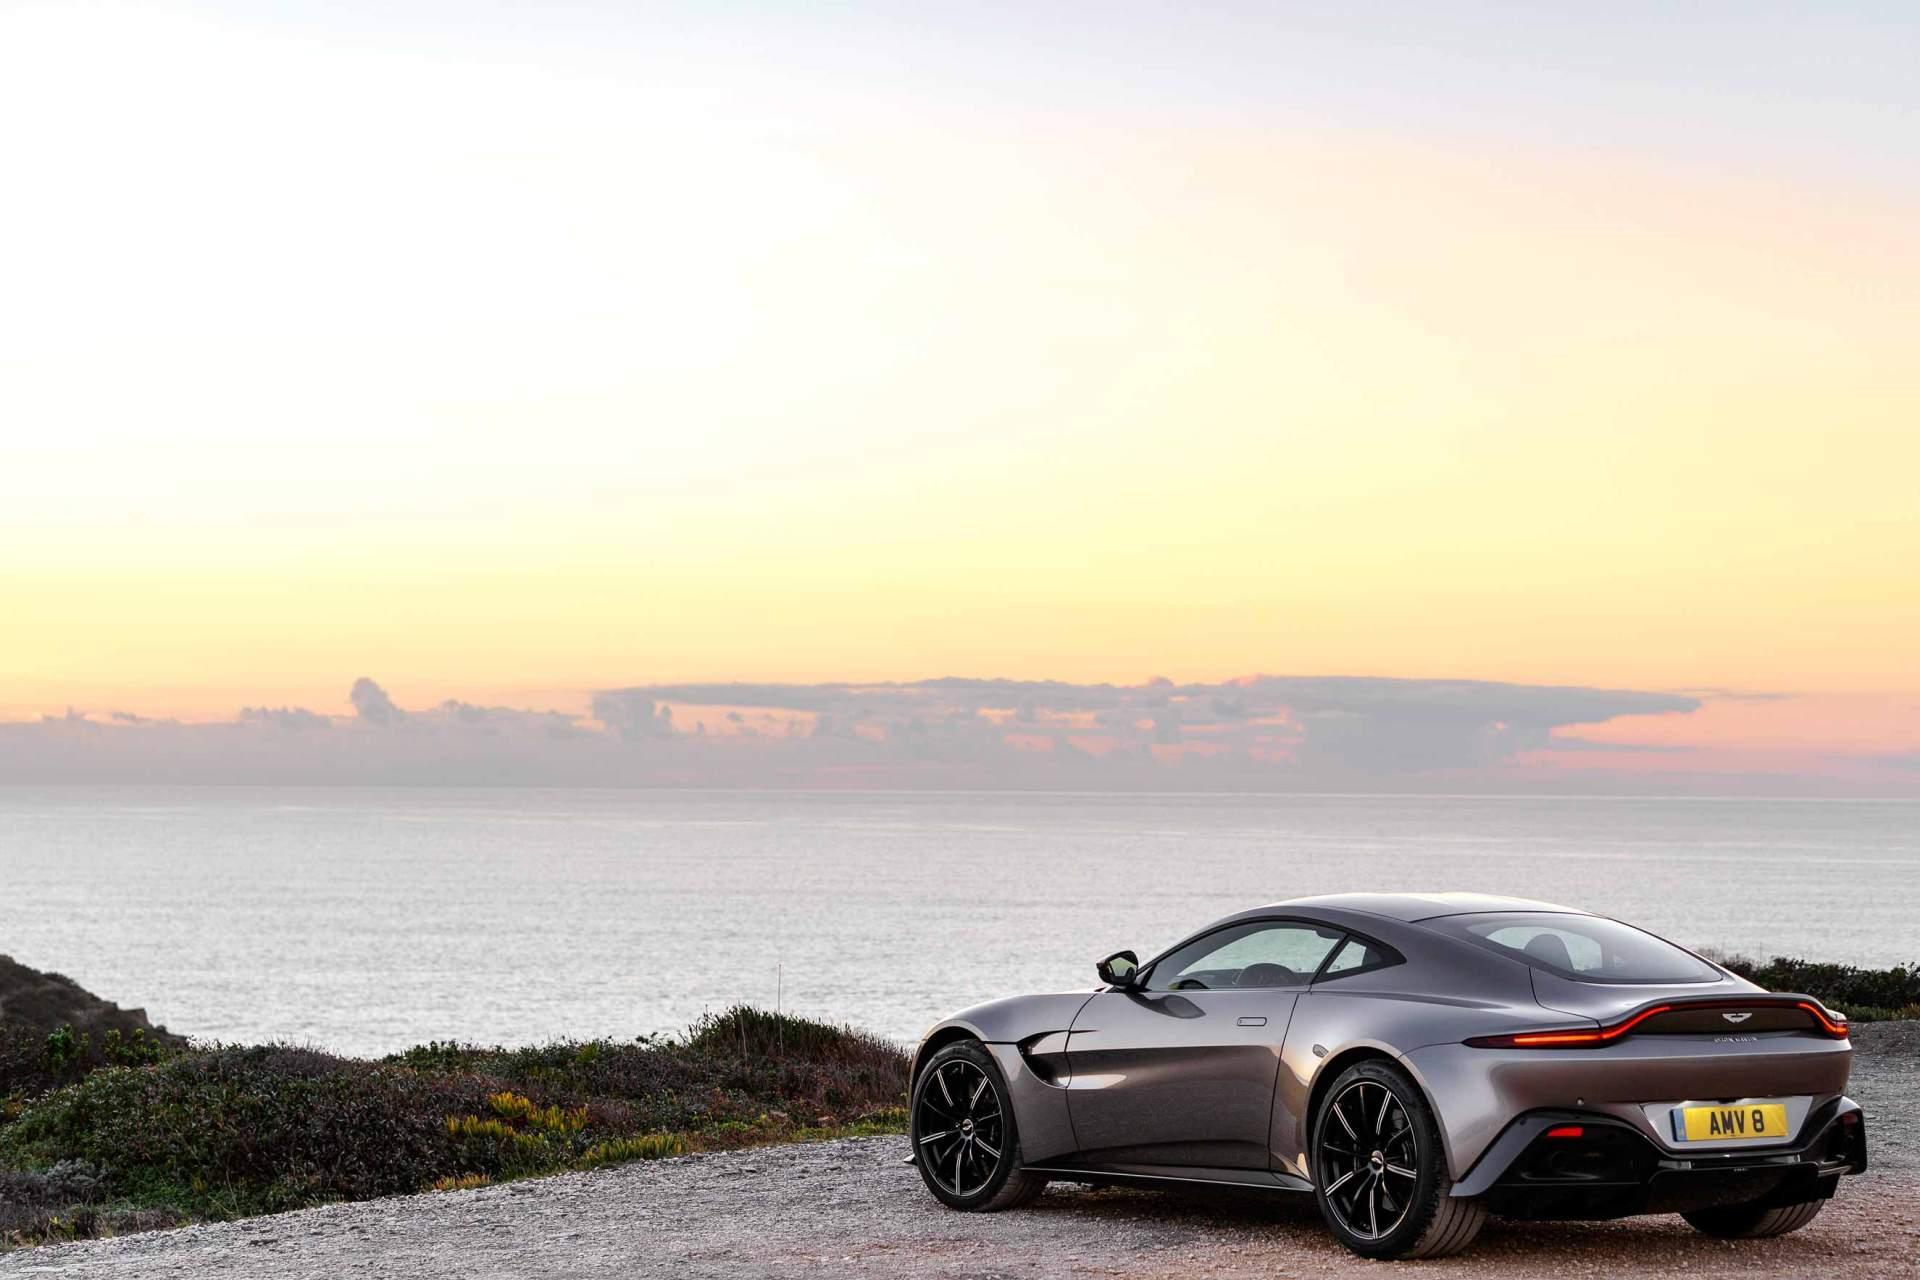 Aston_Martin_V8_Vantage_AMV_8__Portugal_22918w